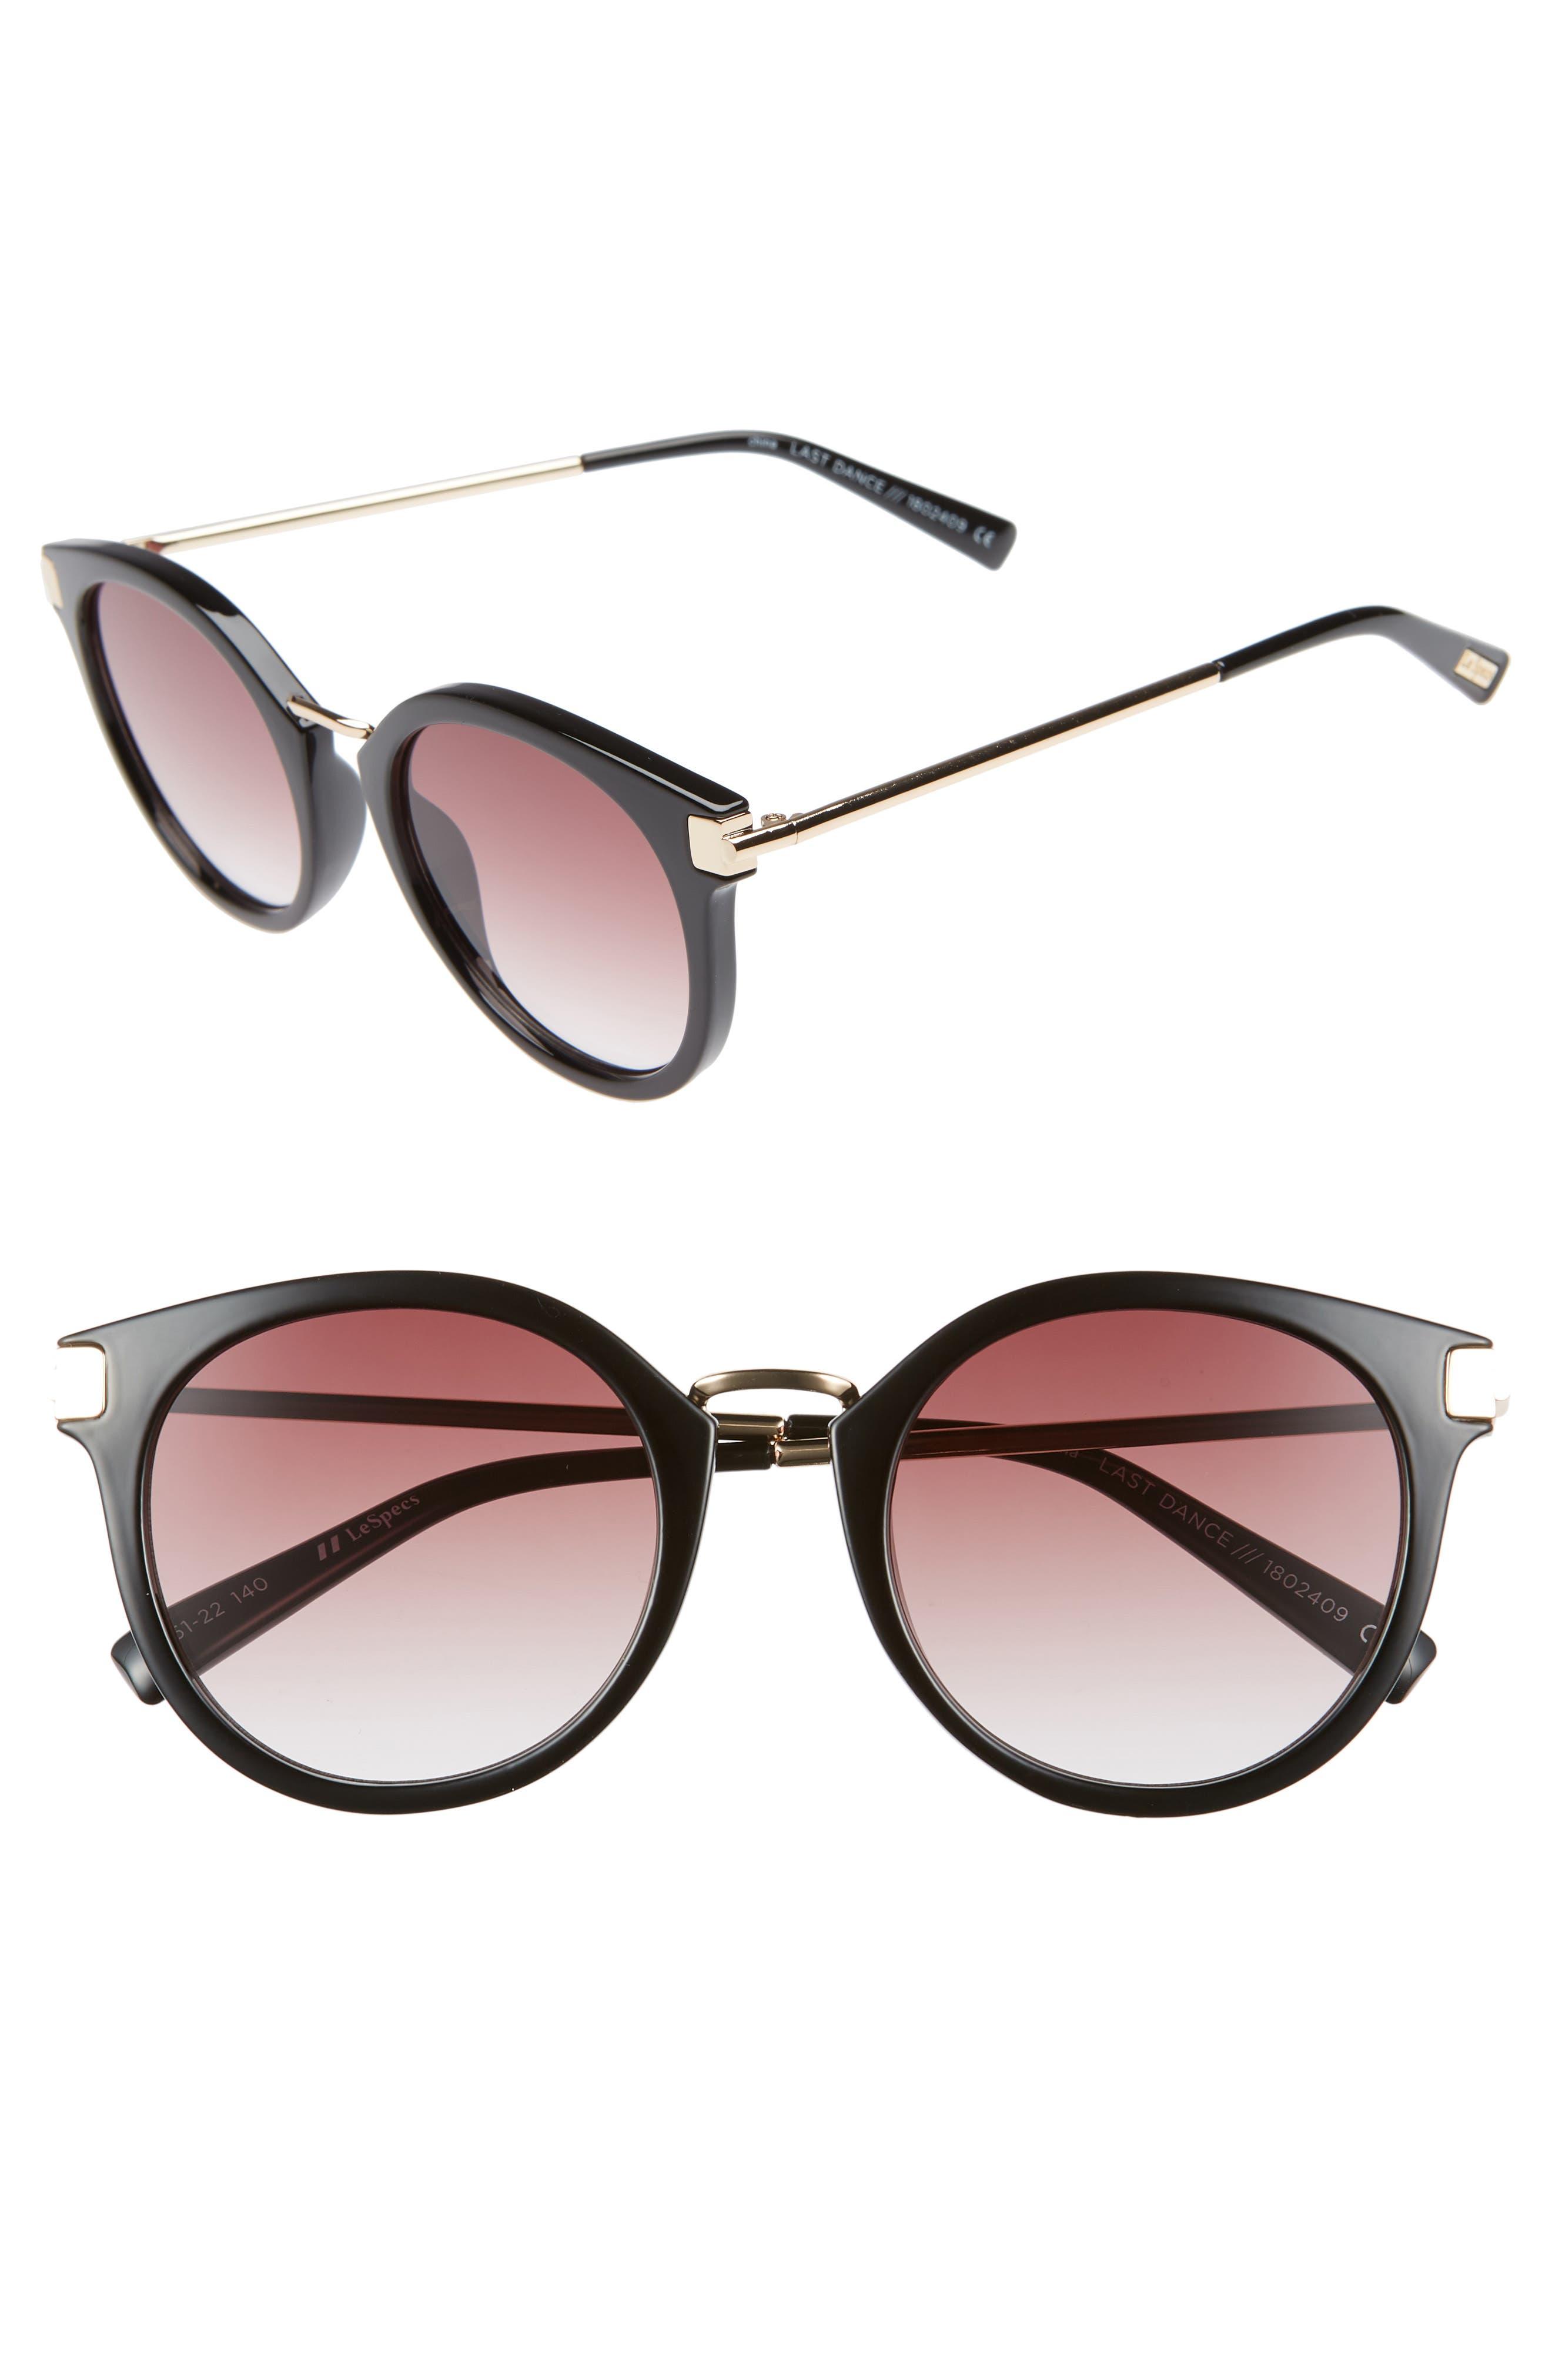 Last Dance 51mm Mirrored Round Sunglasses,                             Main thumbnail 1, color,                             BLACK